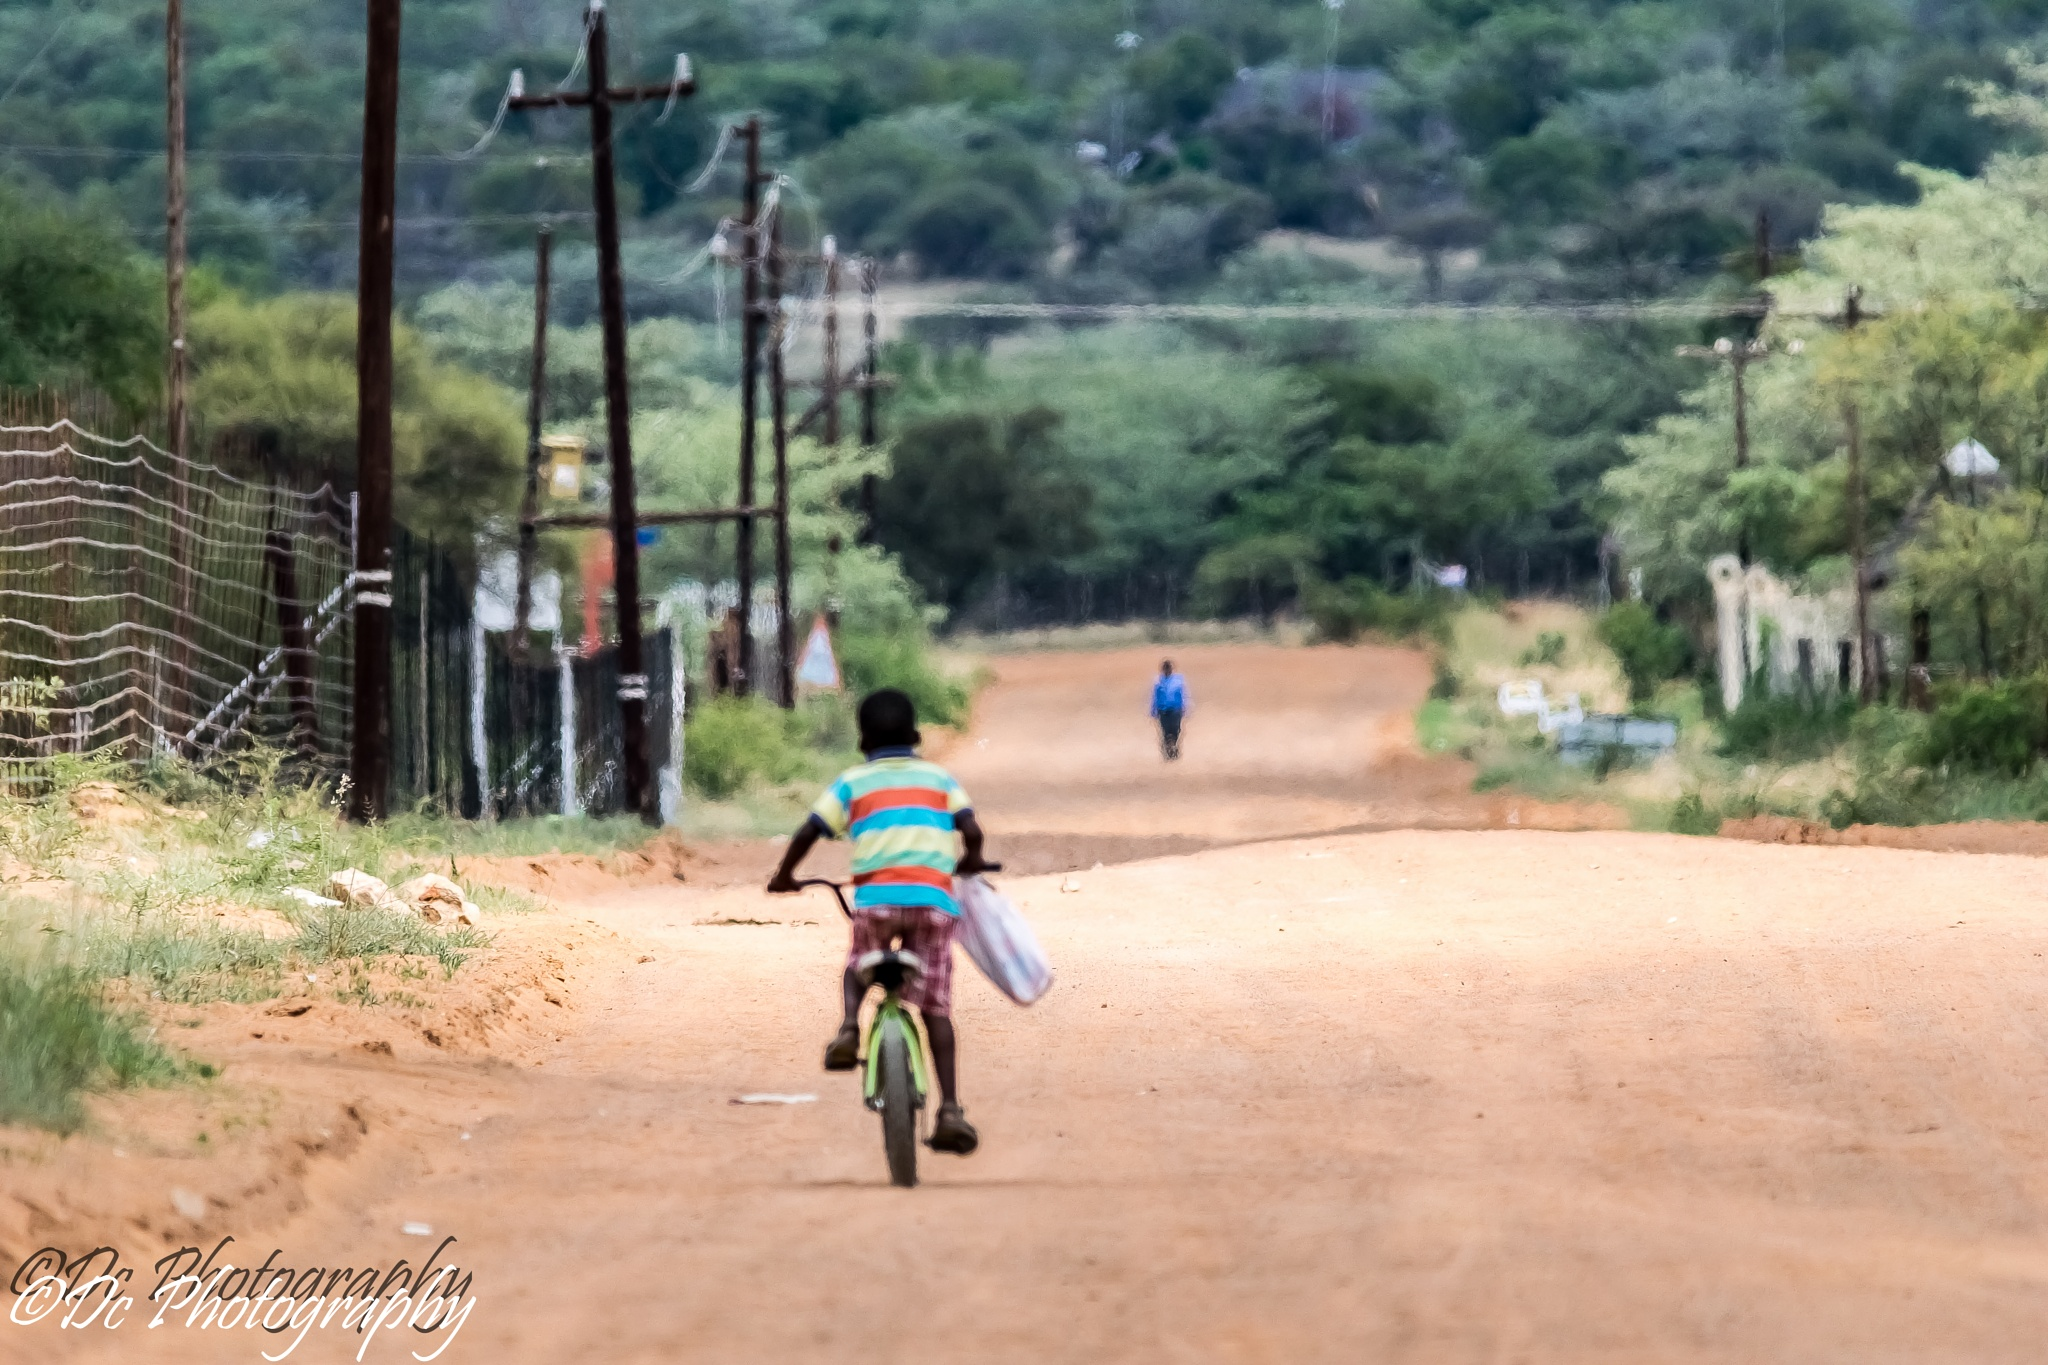 Bicycle Boy by Dusky De Reuck